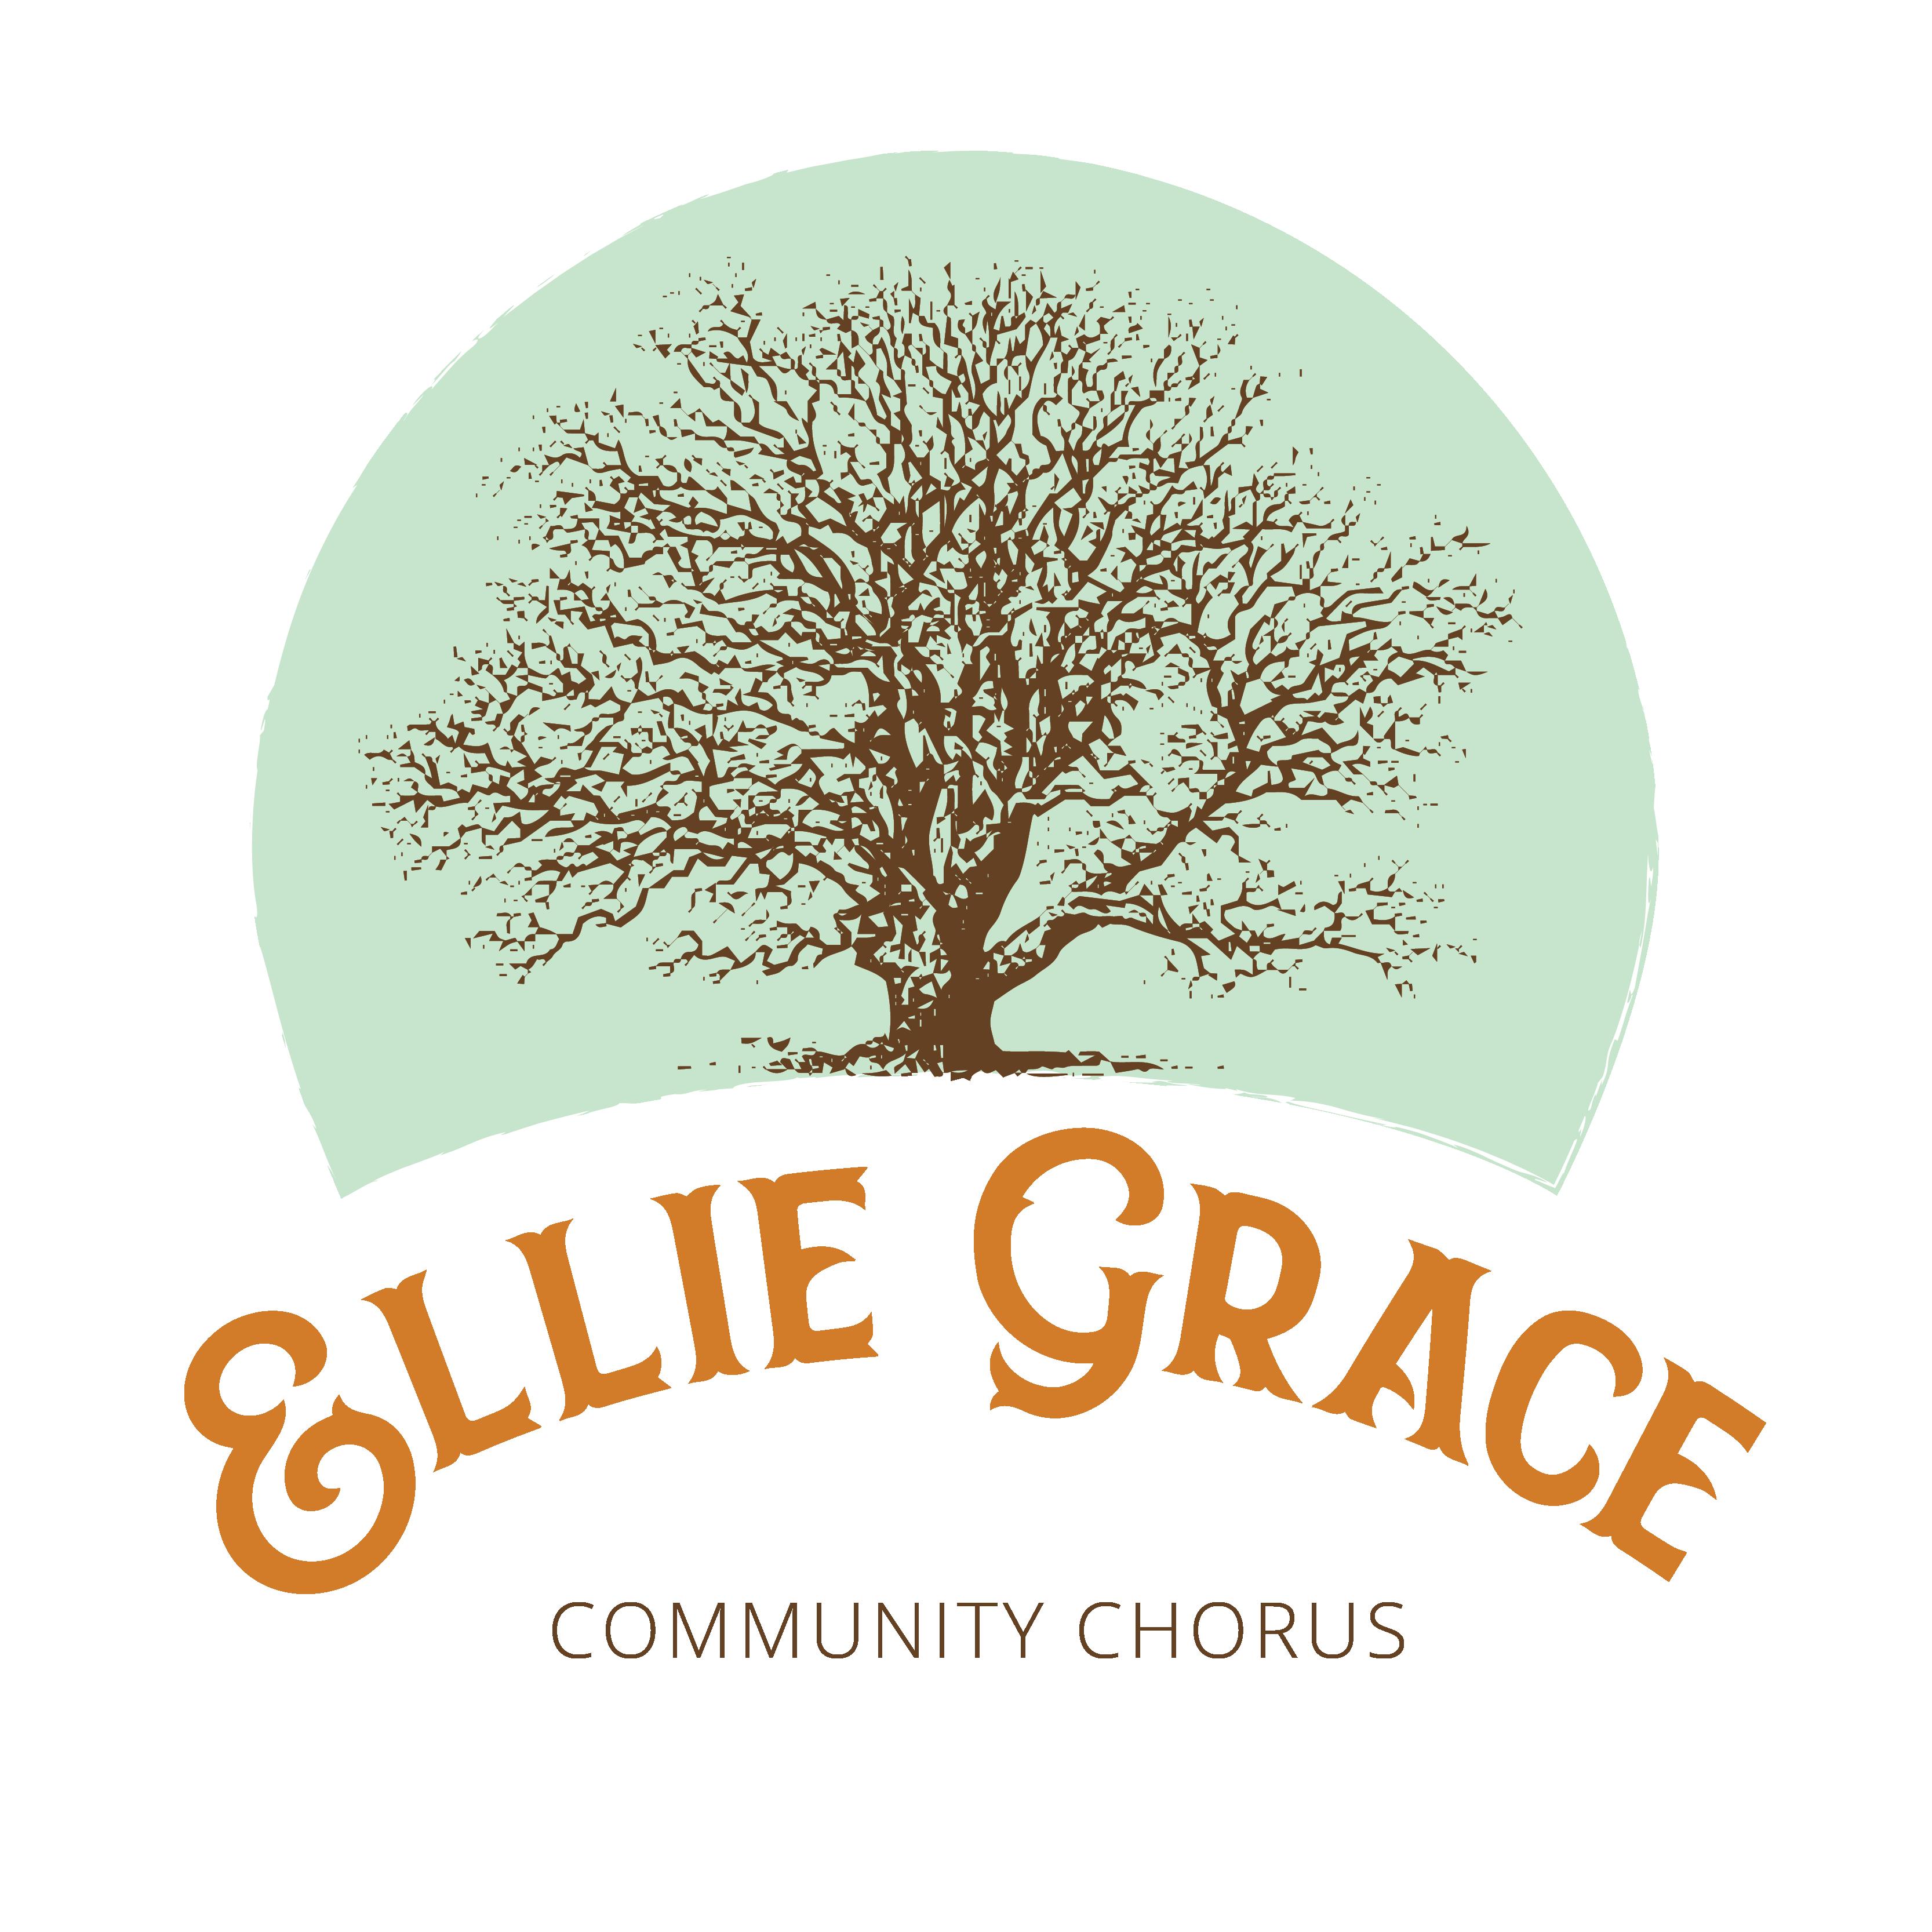 EllieGraceFinalLogo-Community Chorus